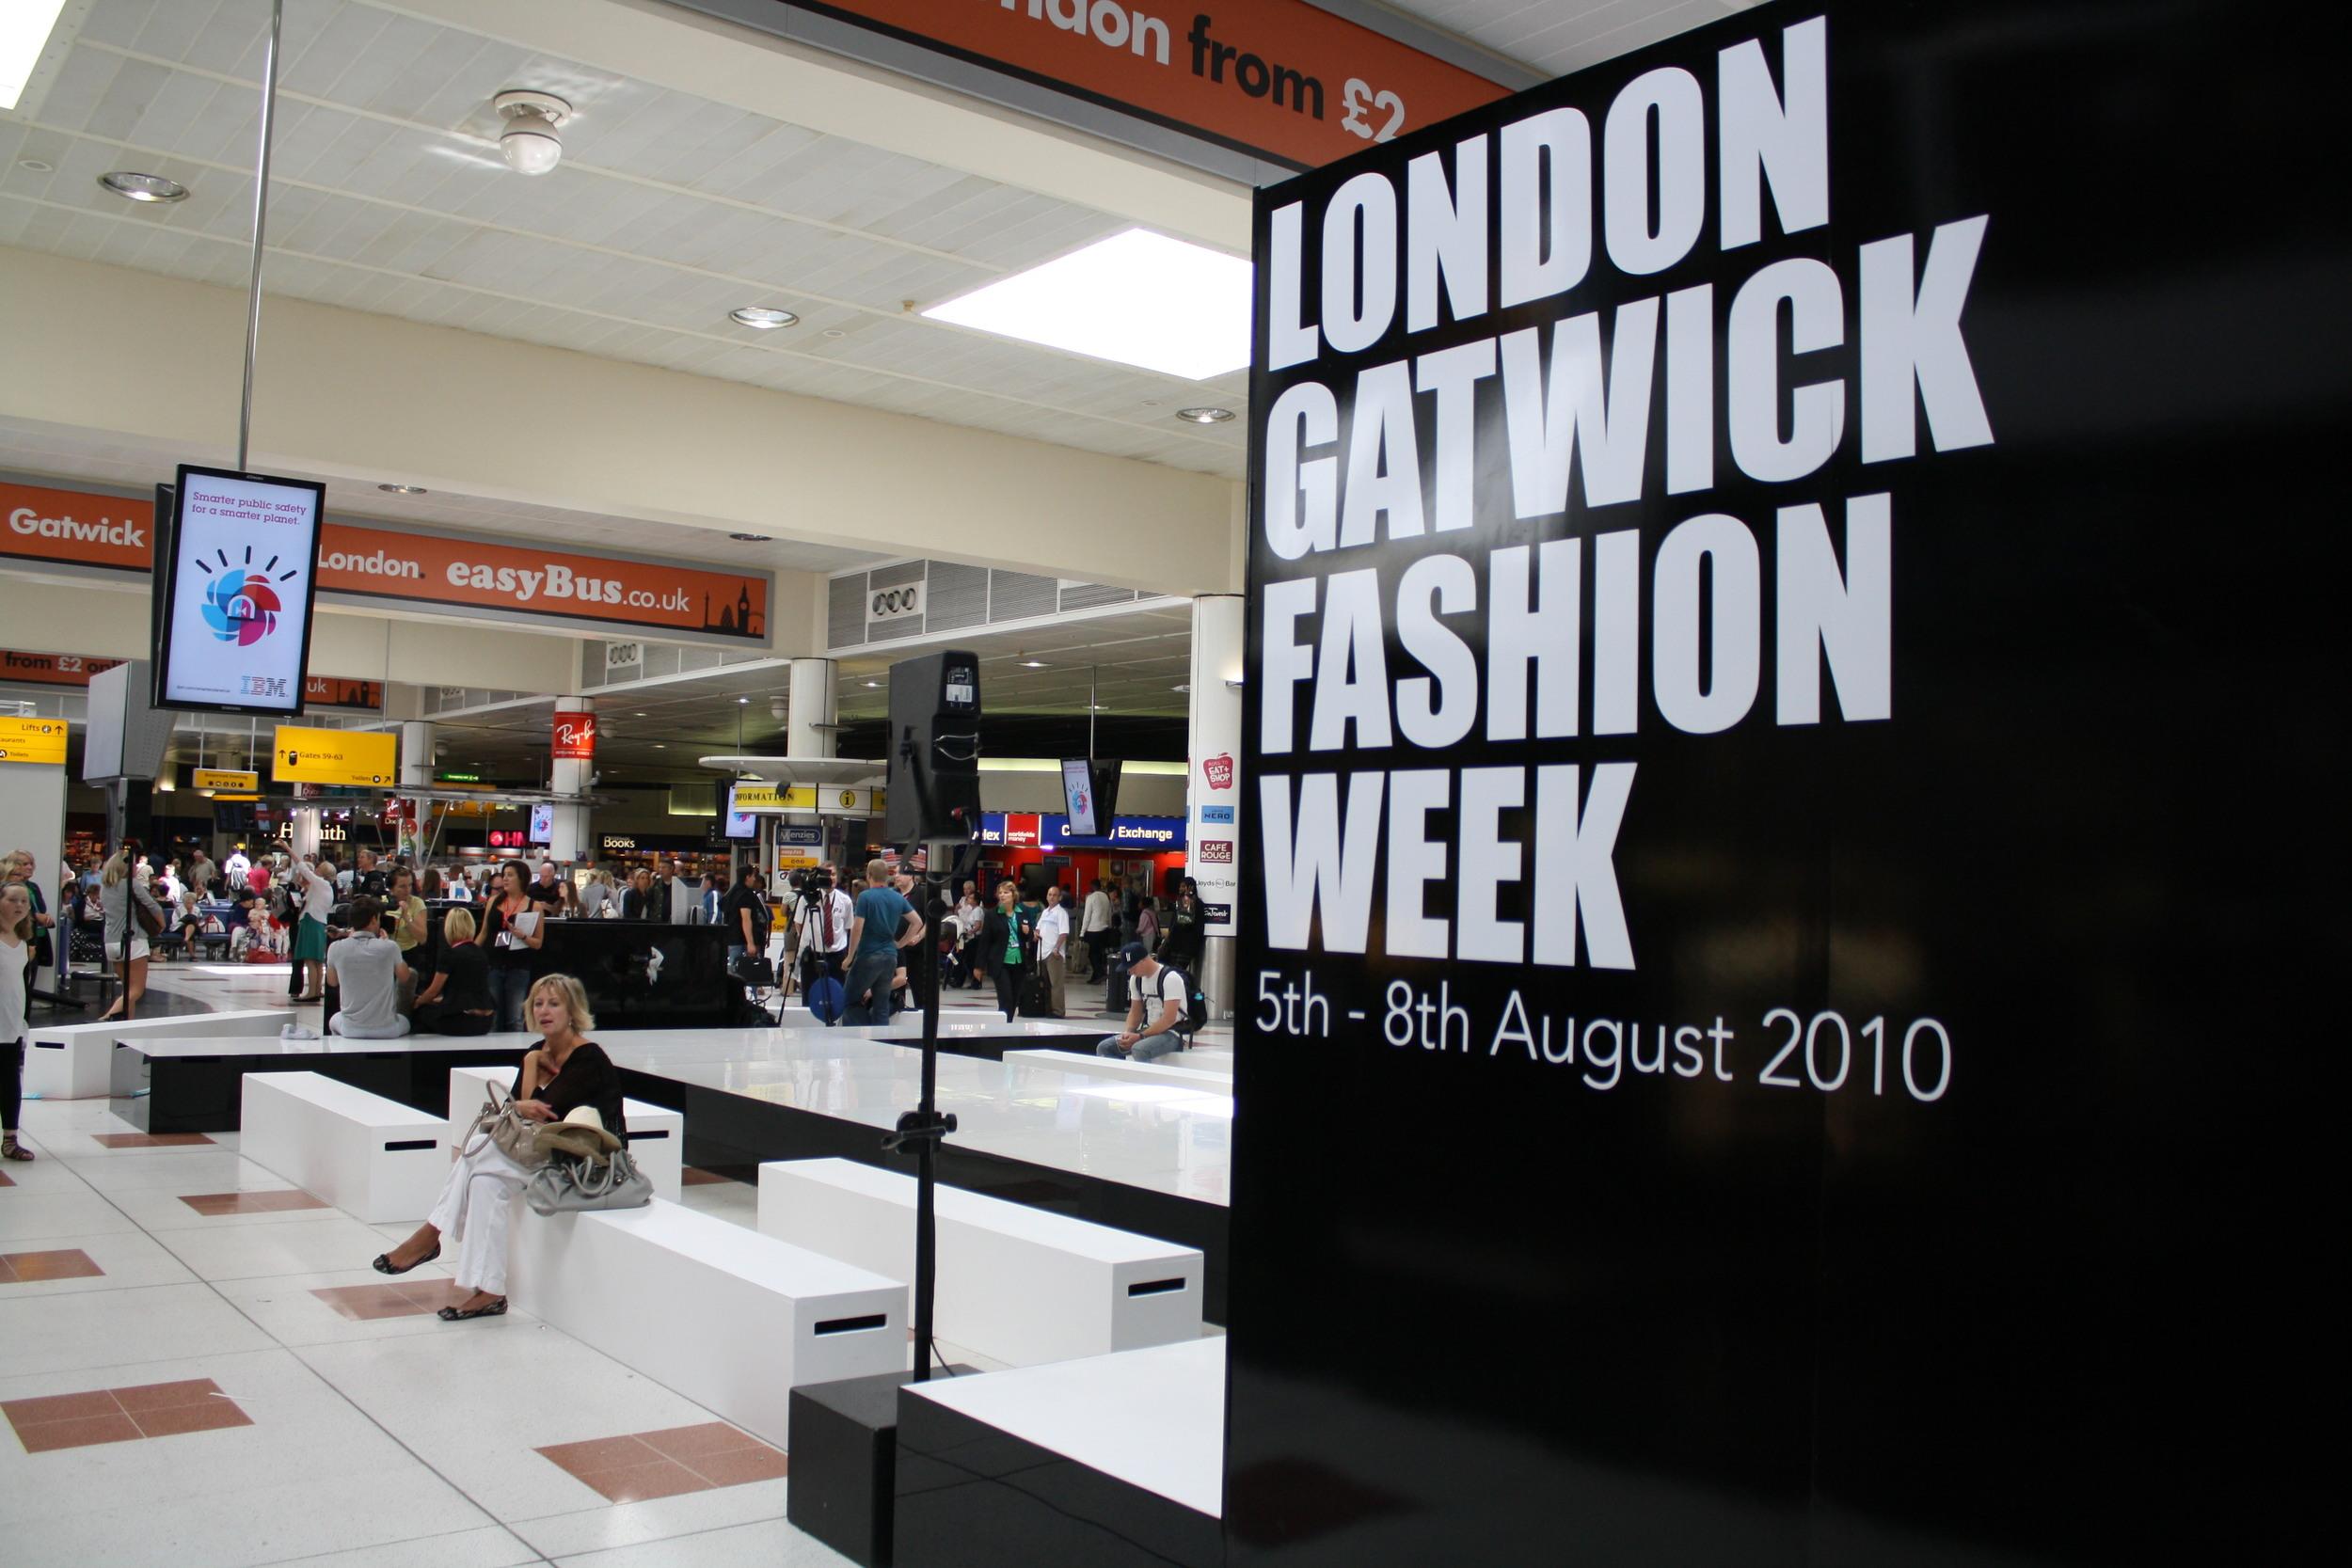 LONDON GATWICK FASHION WEEK